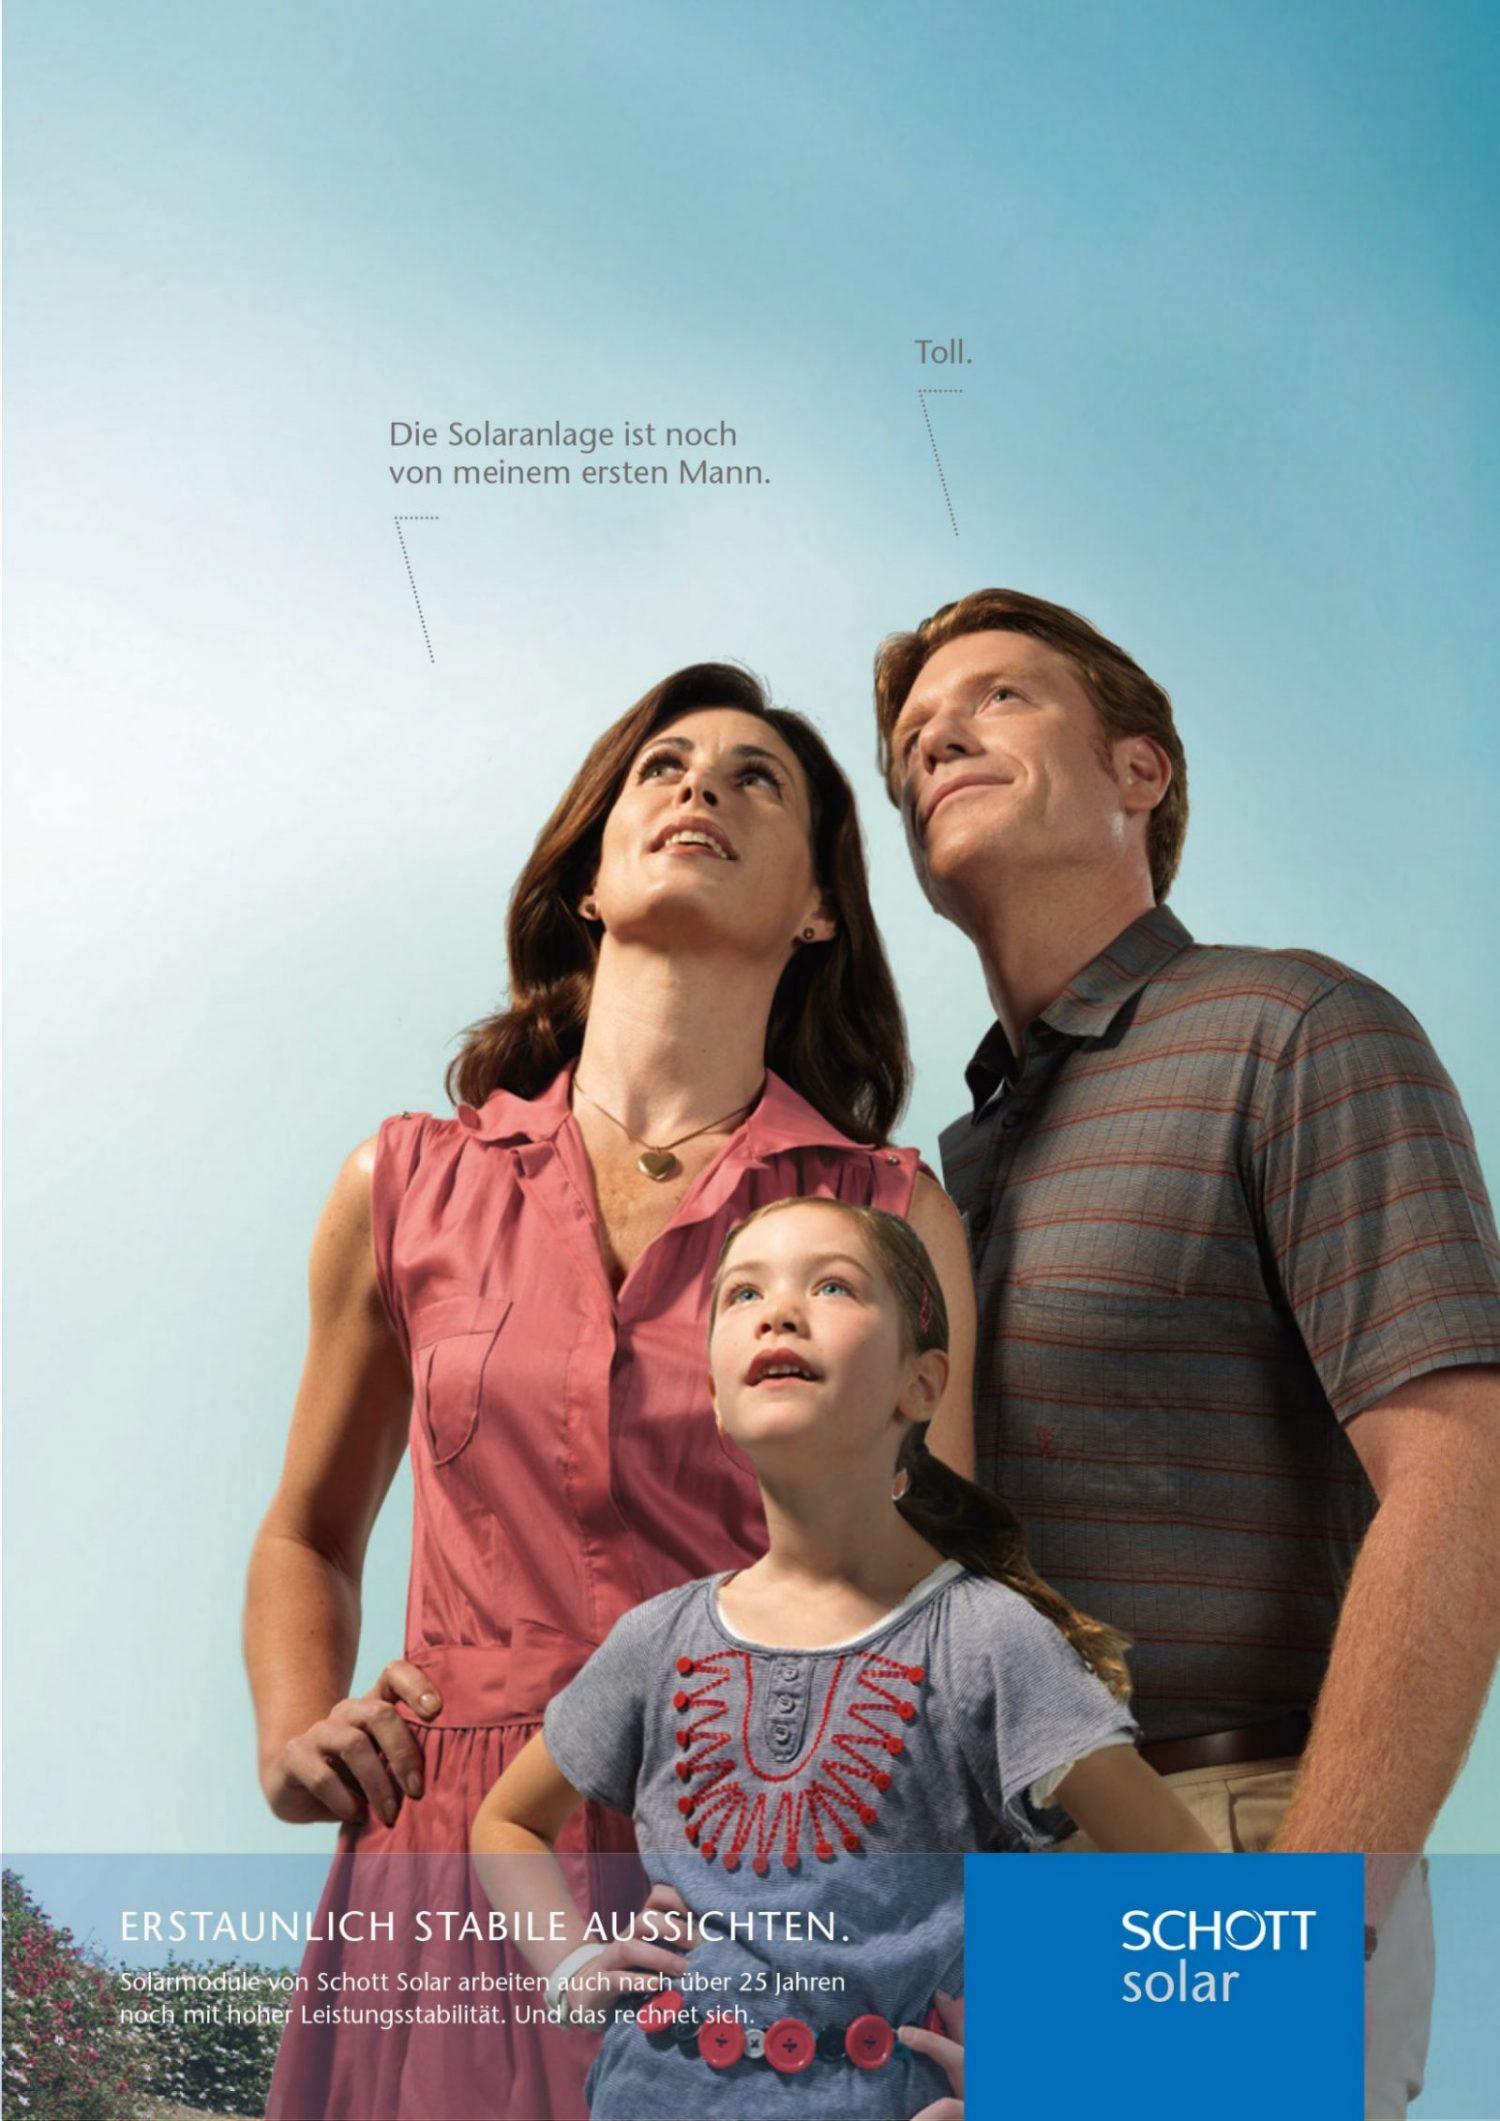 Schott Solar_Family-USA_2809_fin.indd